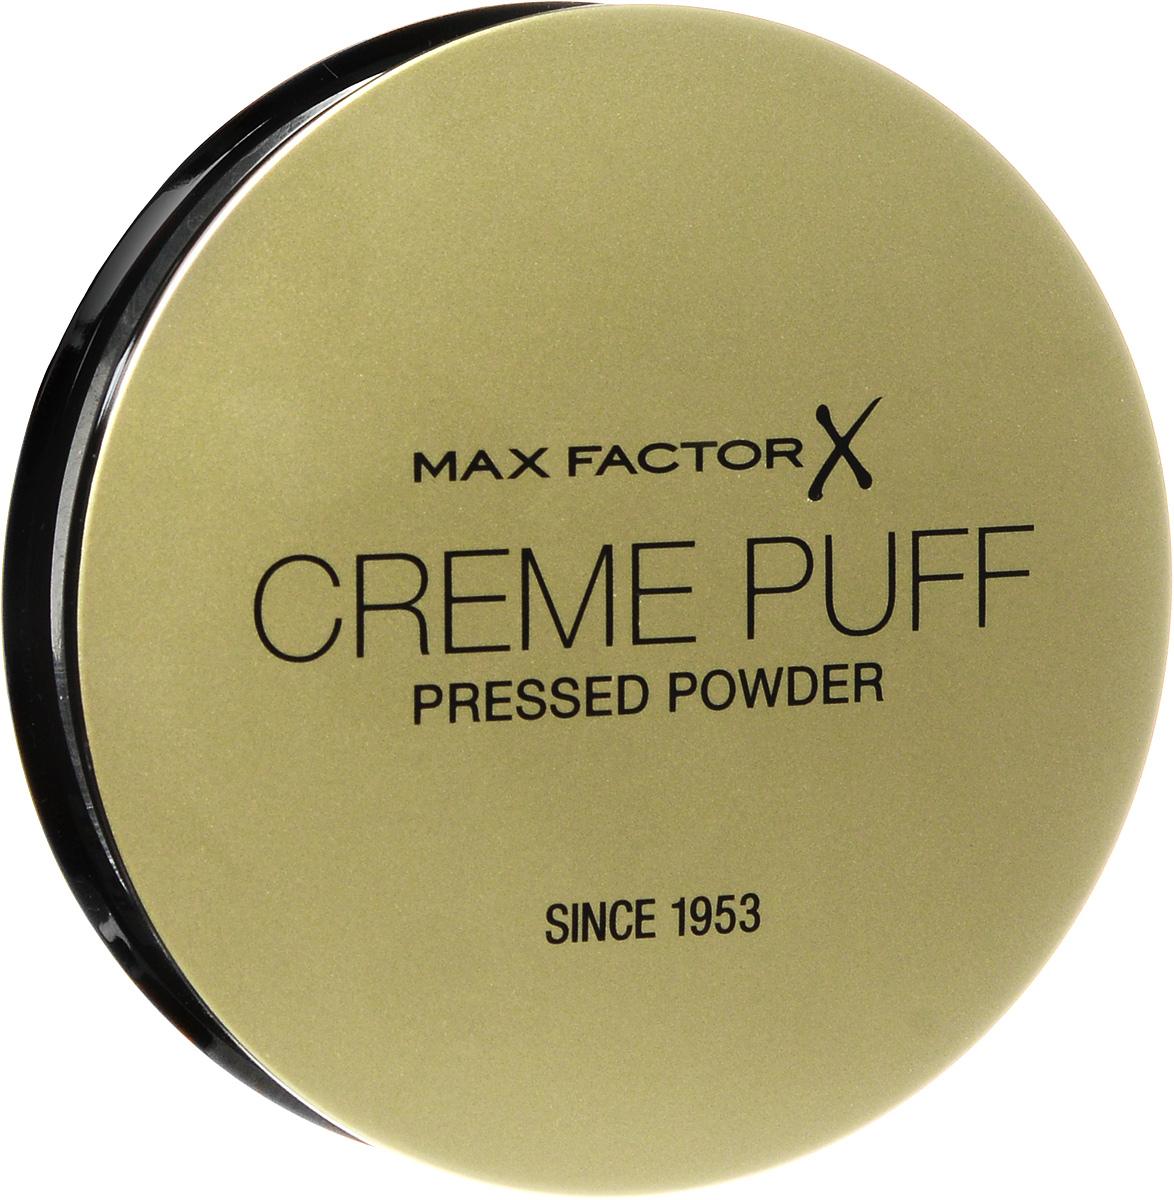 Max Factor Крем-пудра Тональная Creme Puff Powder 13 тон nouveau beige 15 мл